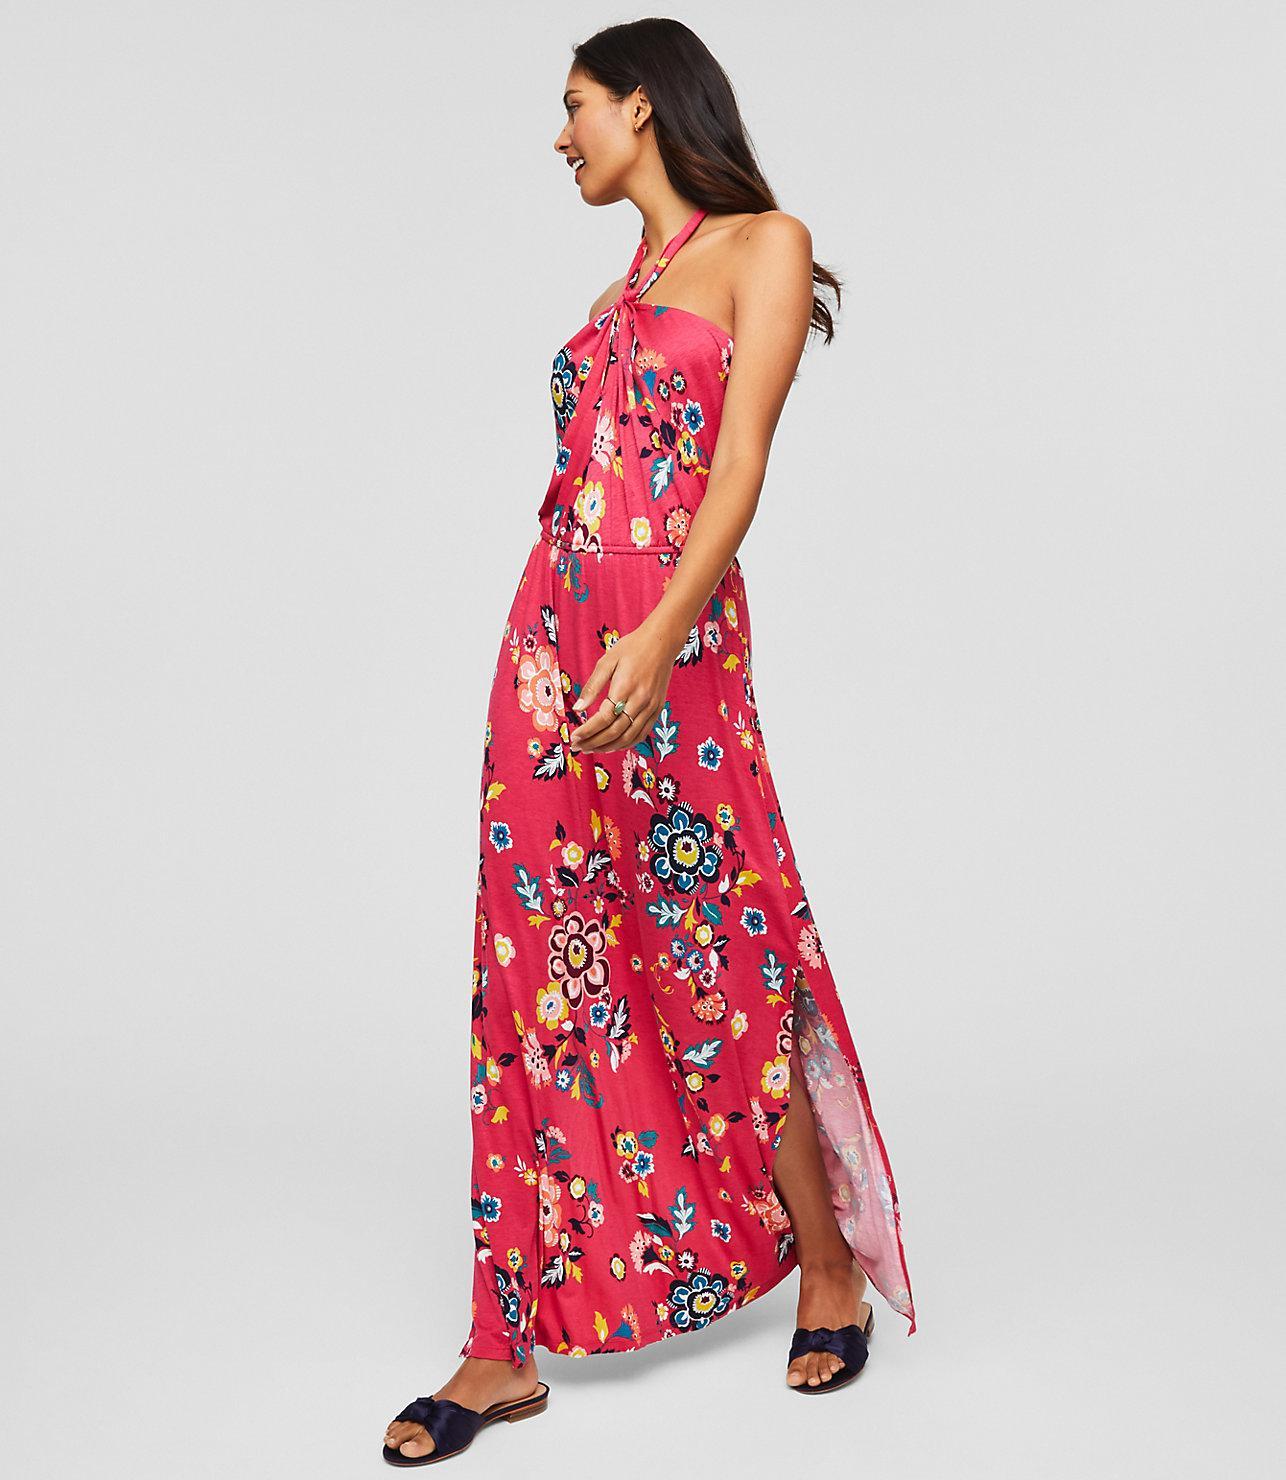 0dc896a9969 LOFT Beach Floral Twist Halter Maxi Dress in Pink - Lyst